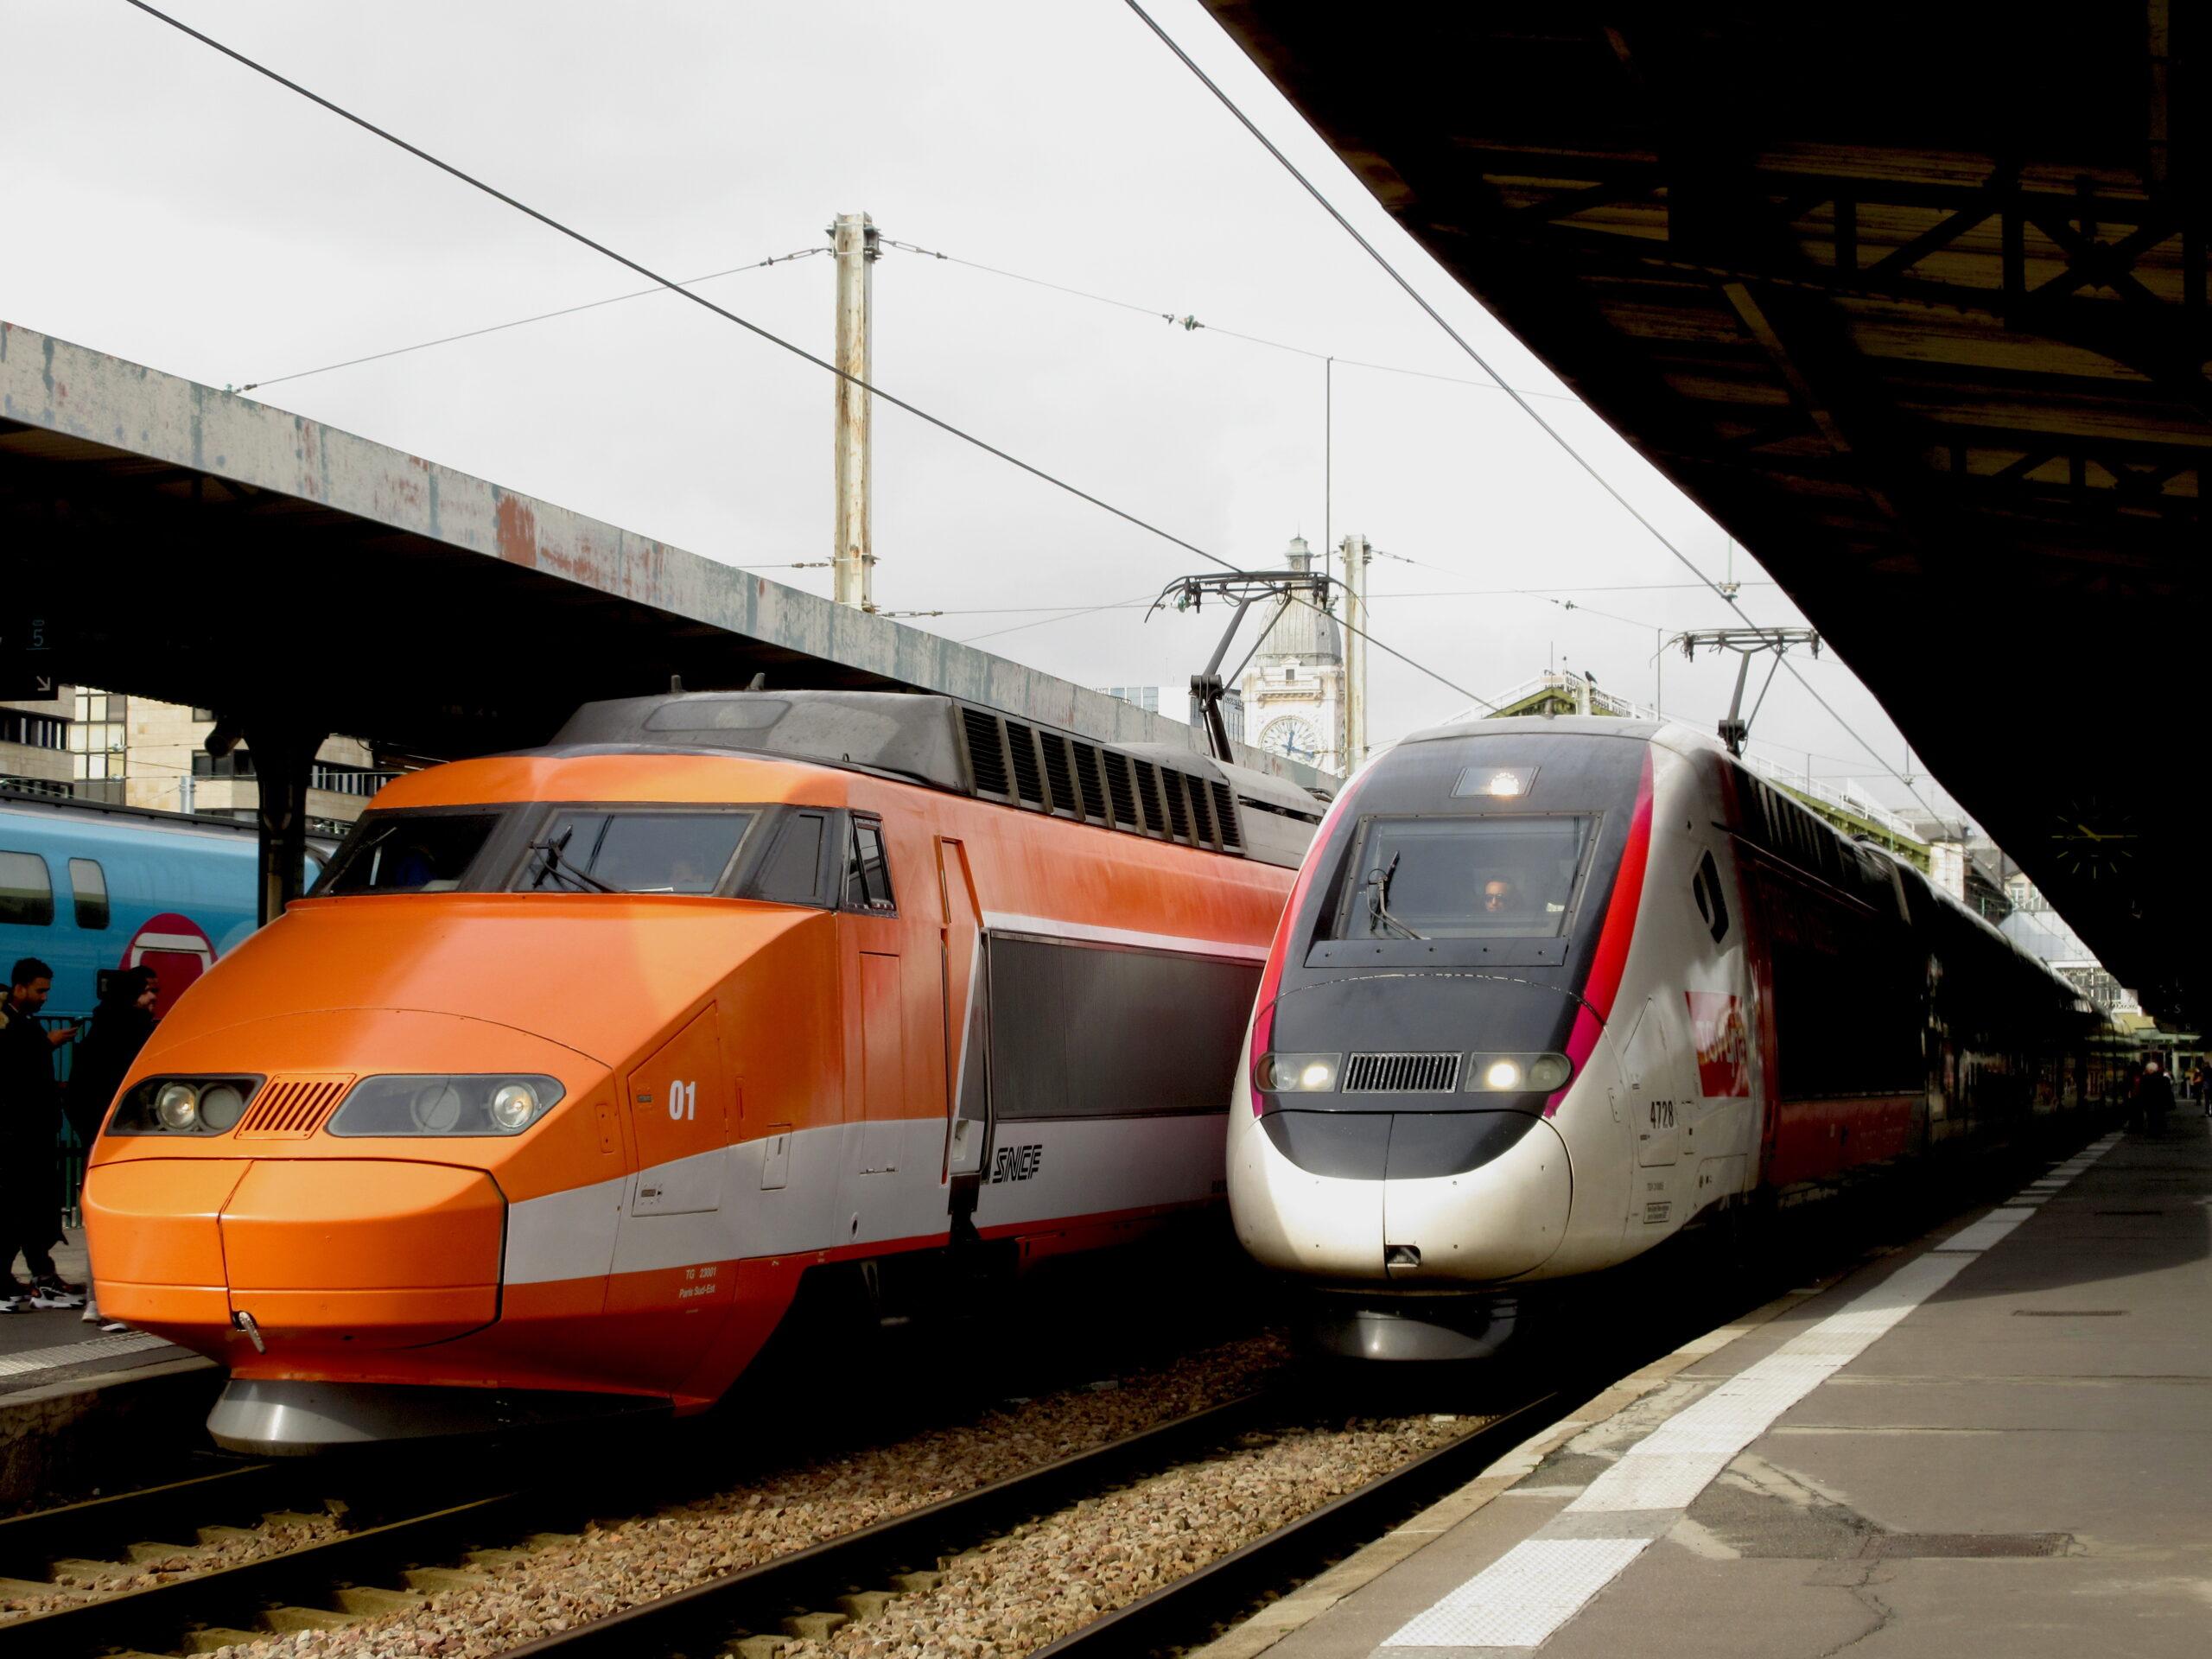 TGV 2N2 Lyria train at Paris' Gare de Lyon station. (CC BY-SA 4.0, Wikimedia Commons)